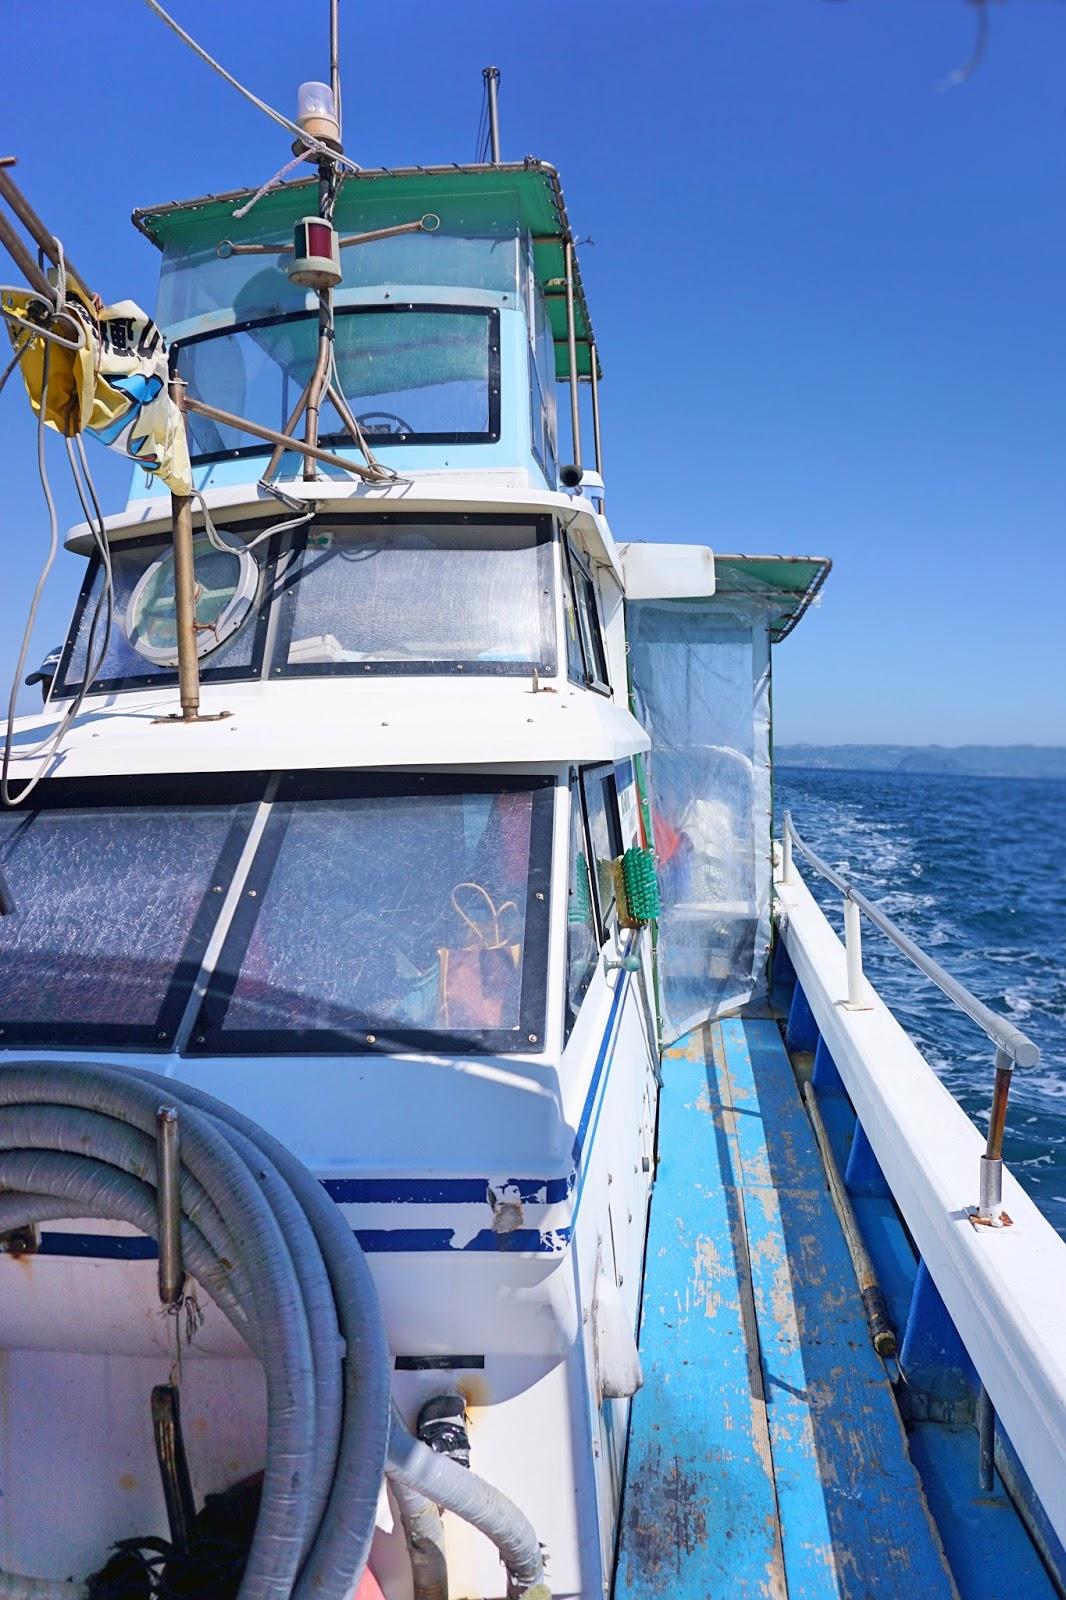 9 days of rustic kyushu, day 4 (part 1): dolphin cruise + unzen